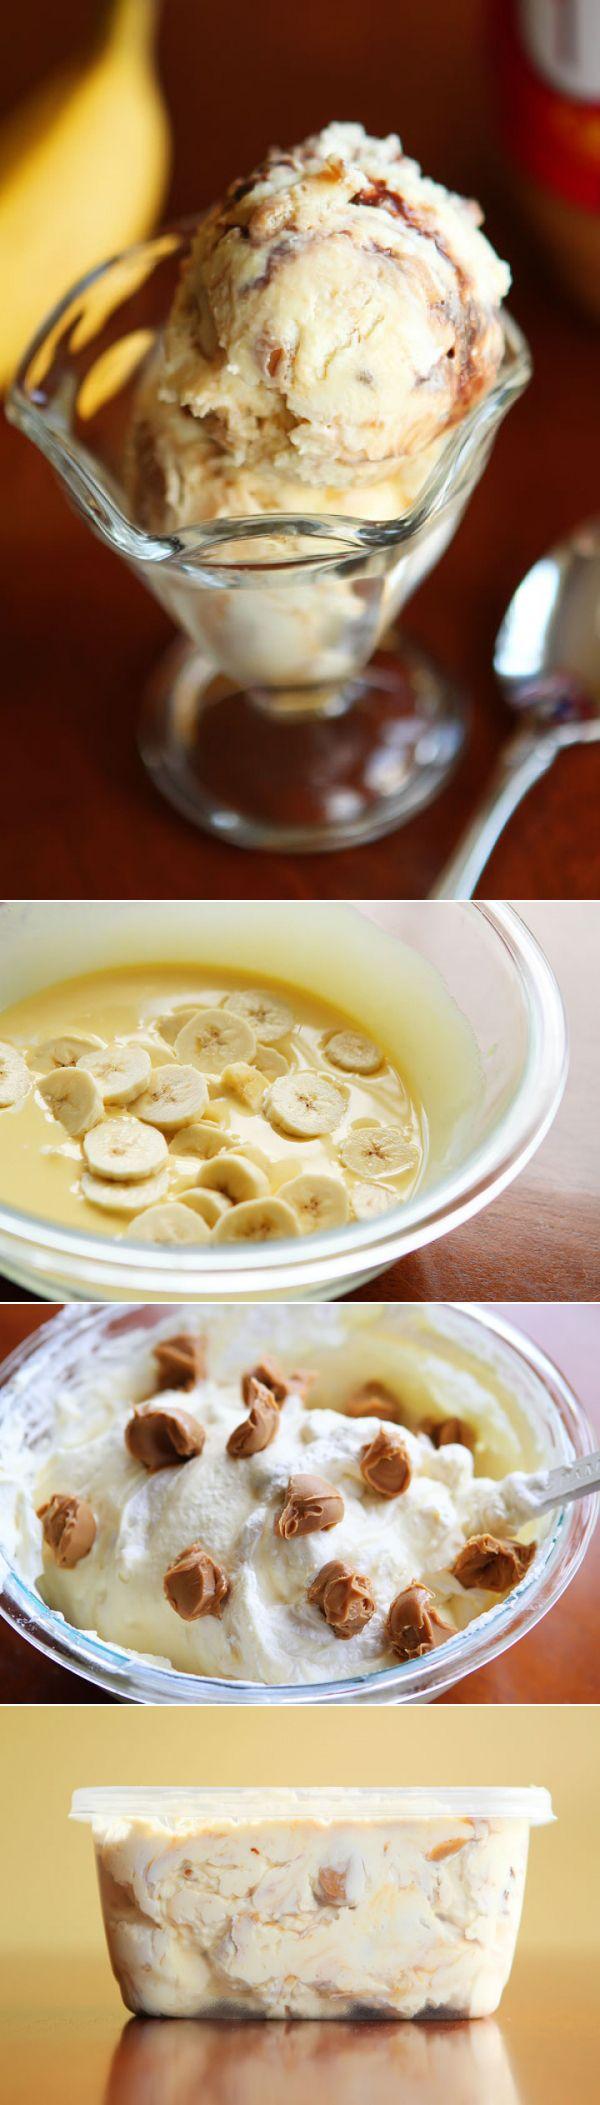 Banana Pudding Ice Cream with Chocolate and Peanut Butter Swirls